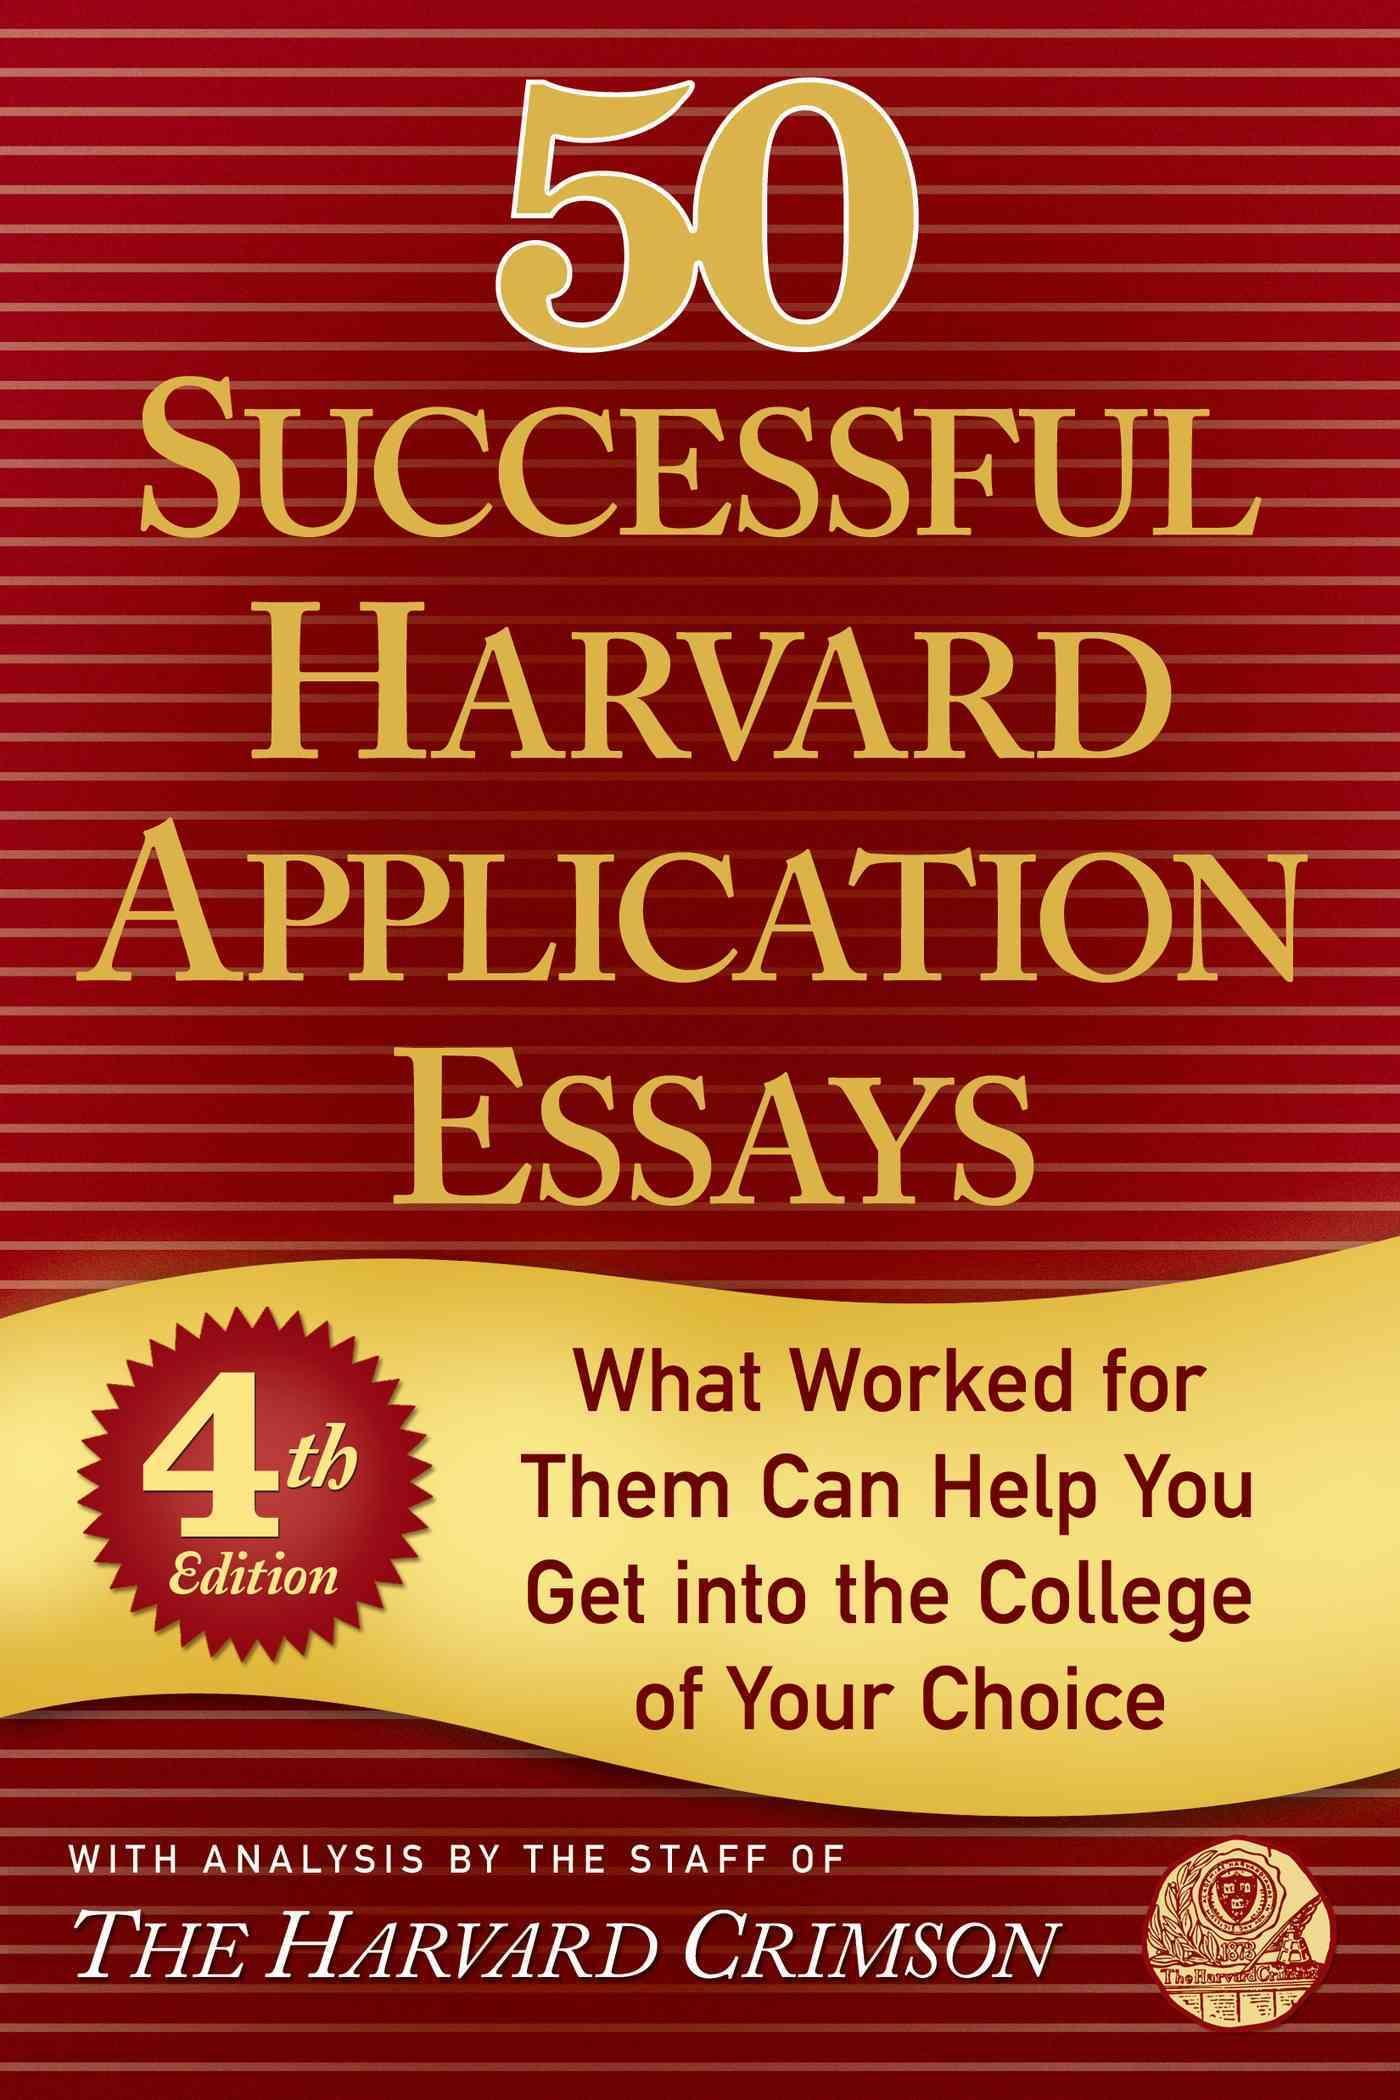 50 Successful Harvard Application Essays By Harvard Crimson (COR)